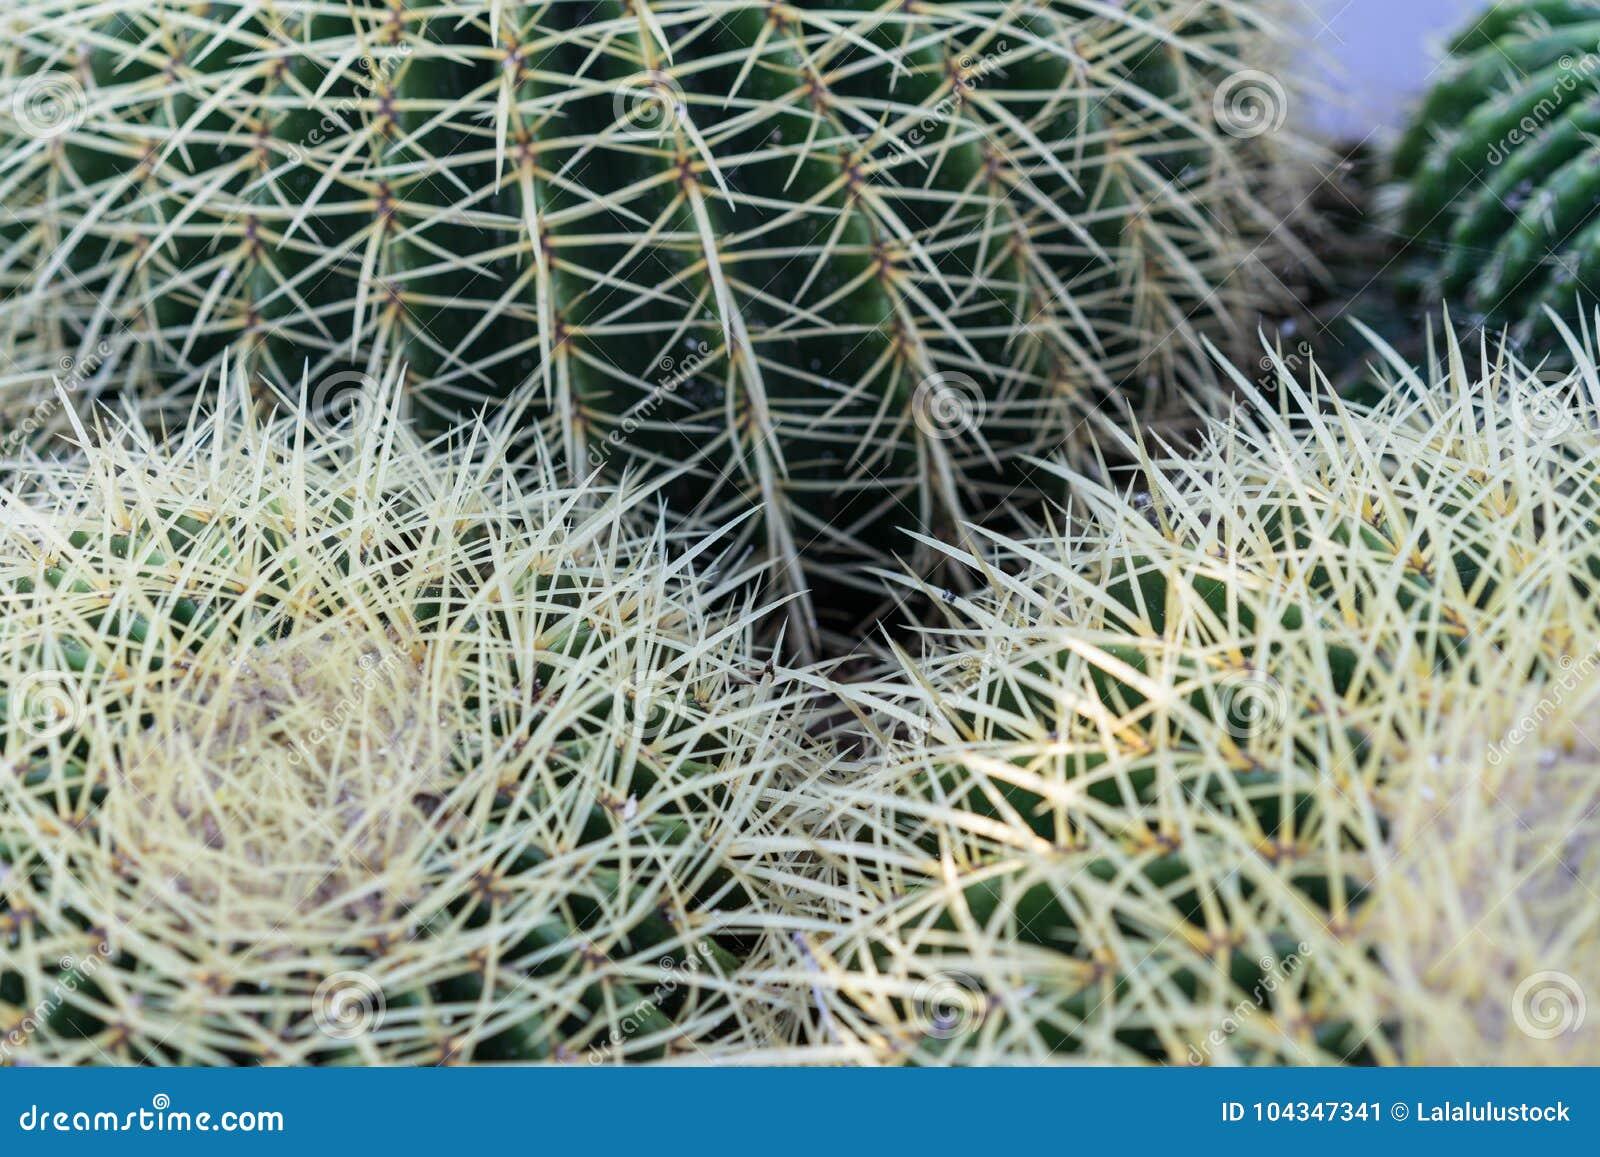 Echinocactus grusonii succulent close up background texture pattern